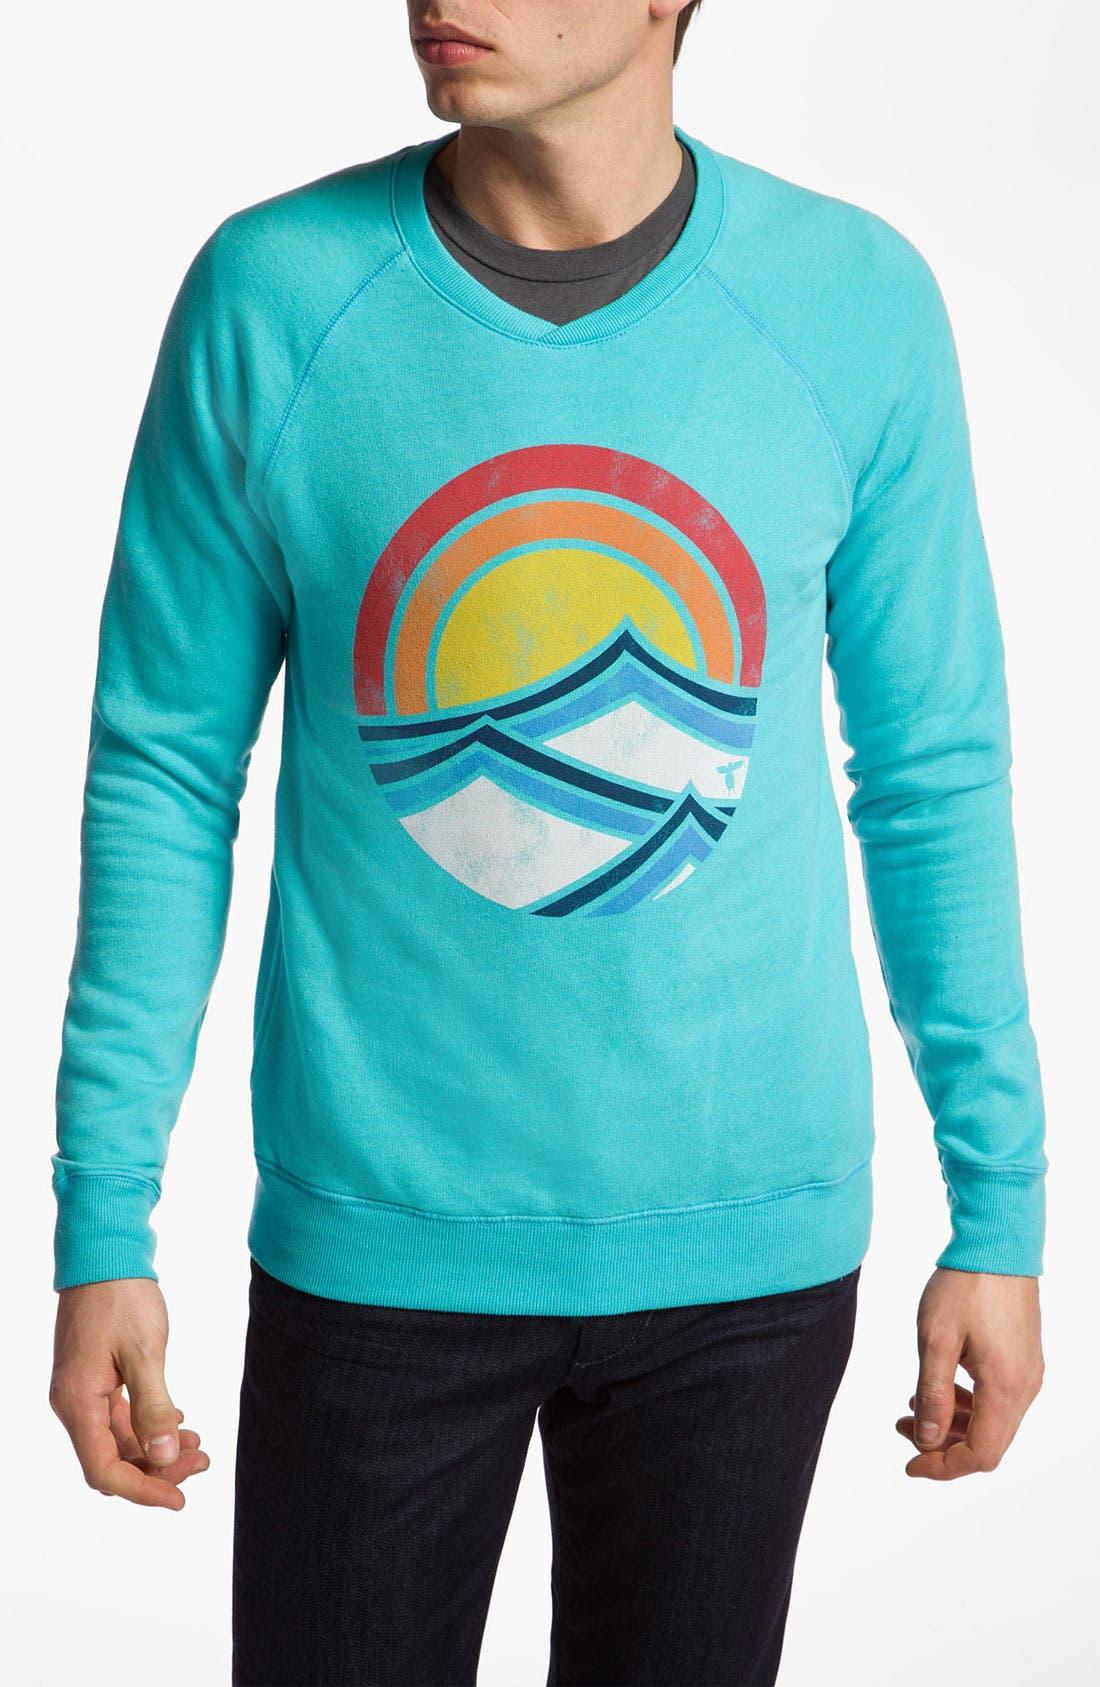 Alternate Image 1 Selected - Topo Ranch 'Swell Rise' Crewneck Sweatshirt